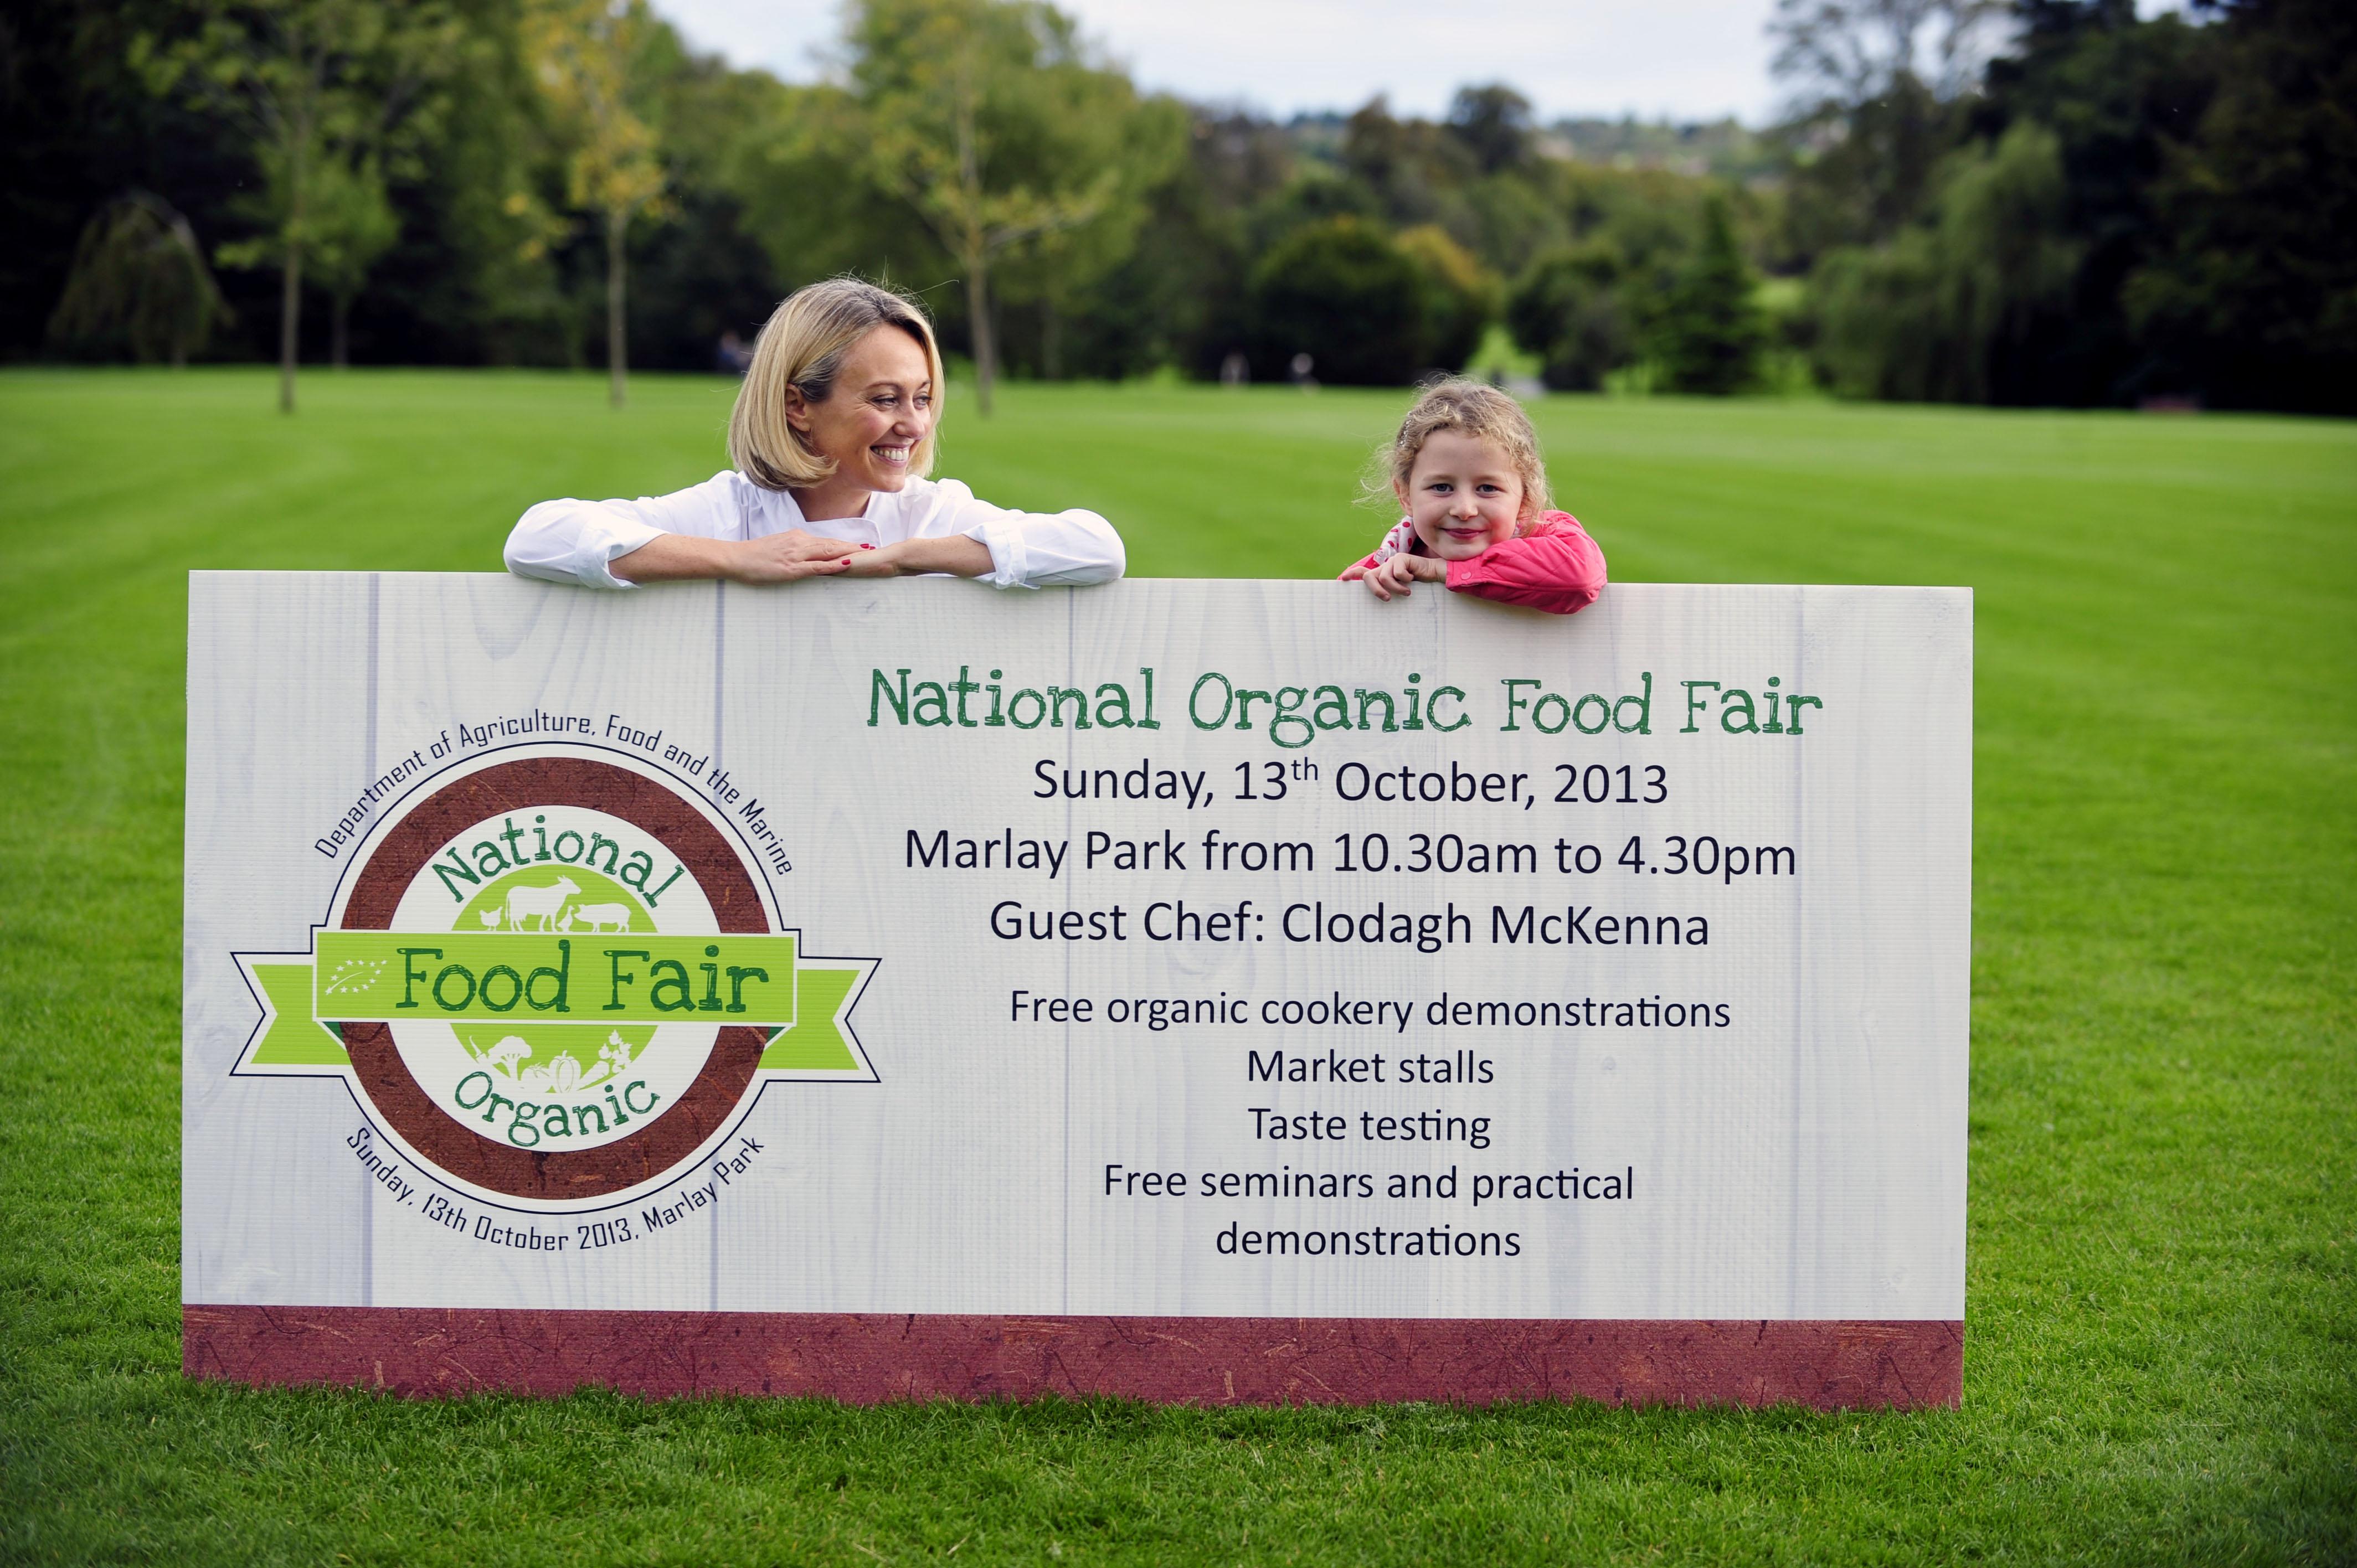 National Organic Food Fair